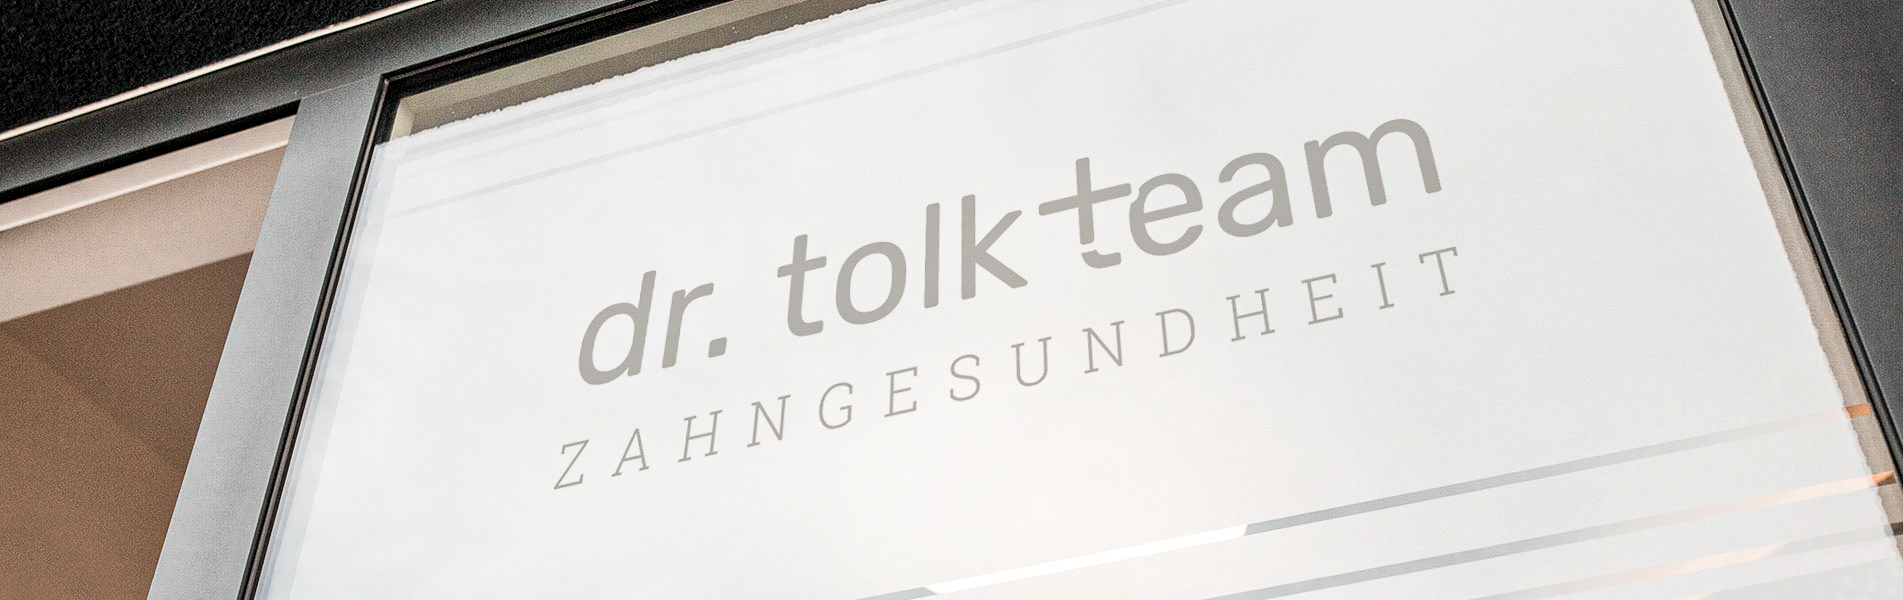 Kontakt- Zahnarztpraxis Dr. Tolk + Team in Kreuzau bei Düren